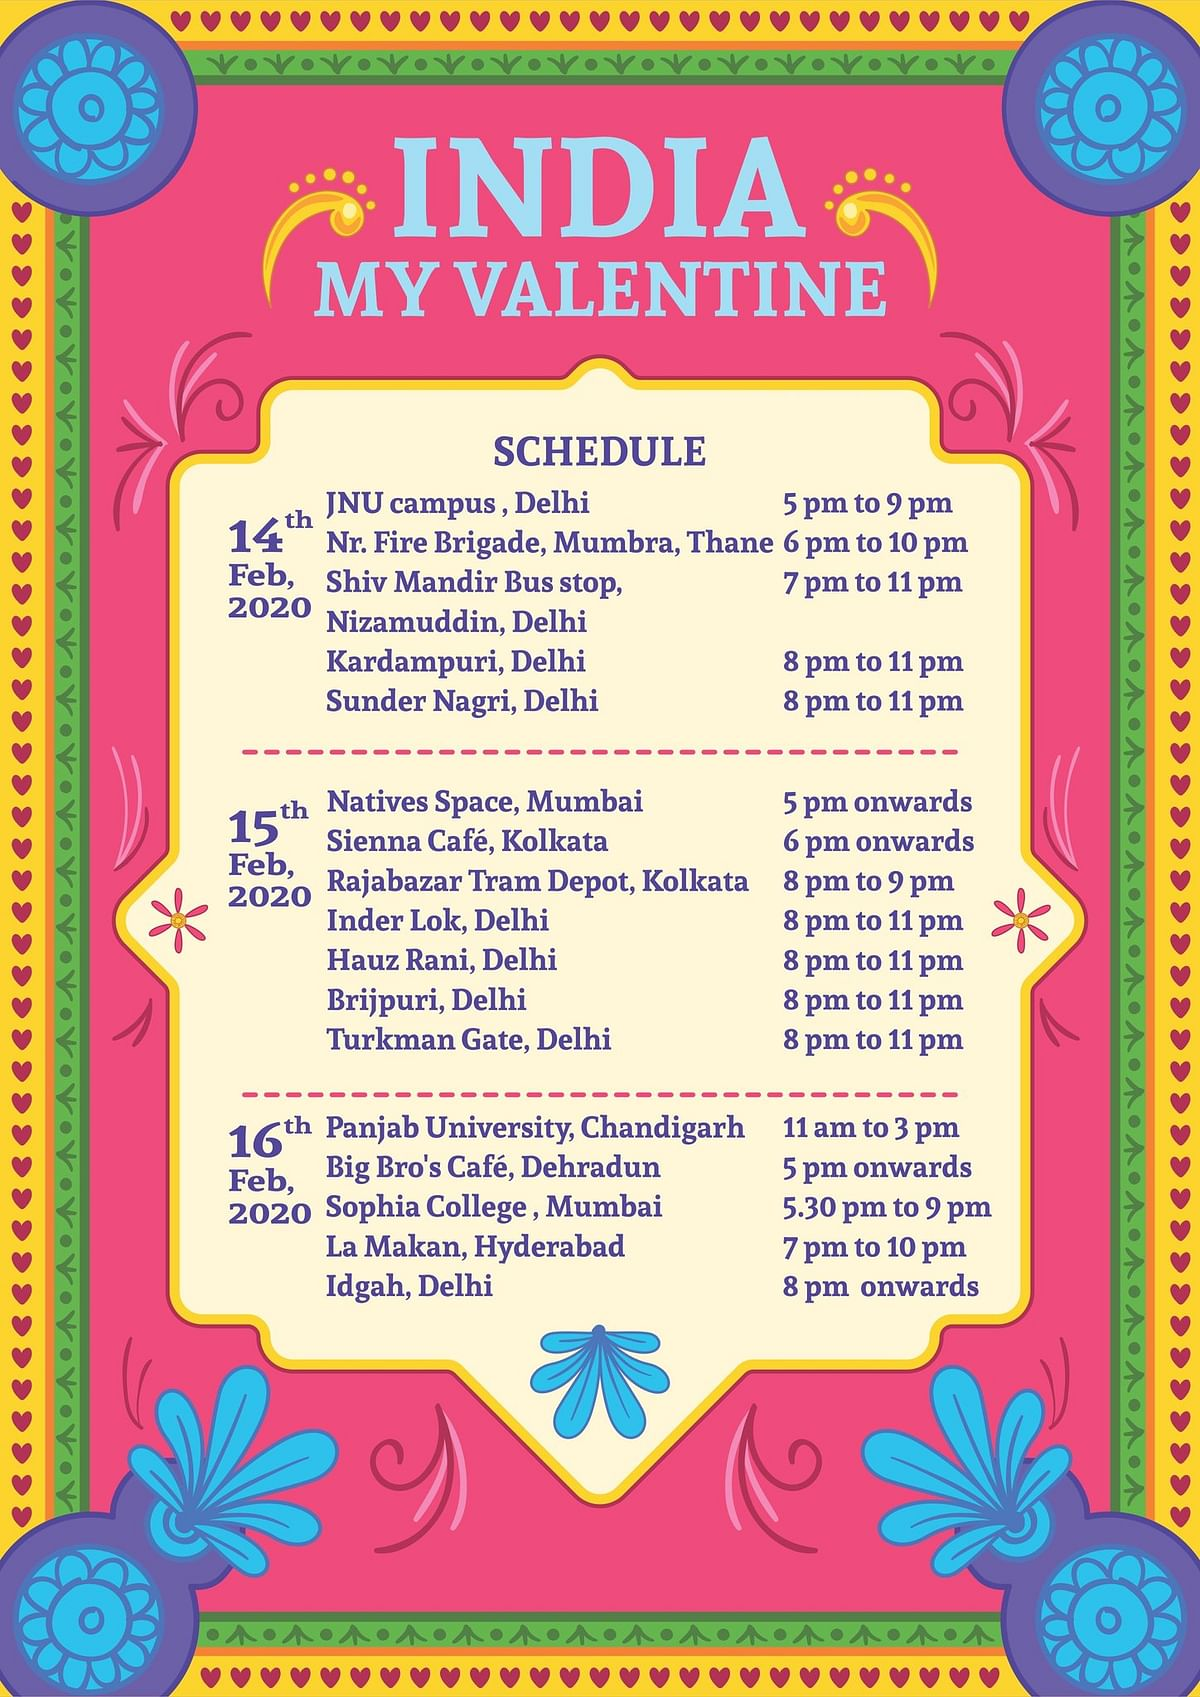 Naseeruddin Shah, Swara Bhasker and other artists unite in Mumbai to celebrate India over Valentine's weekend